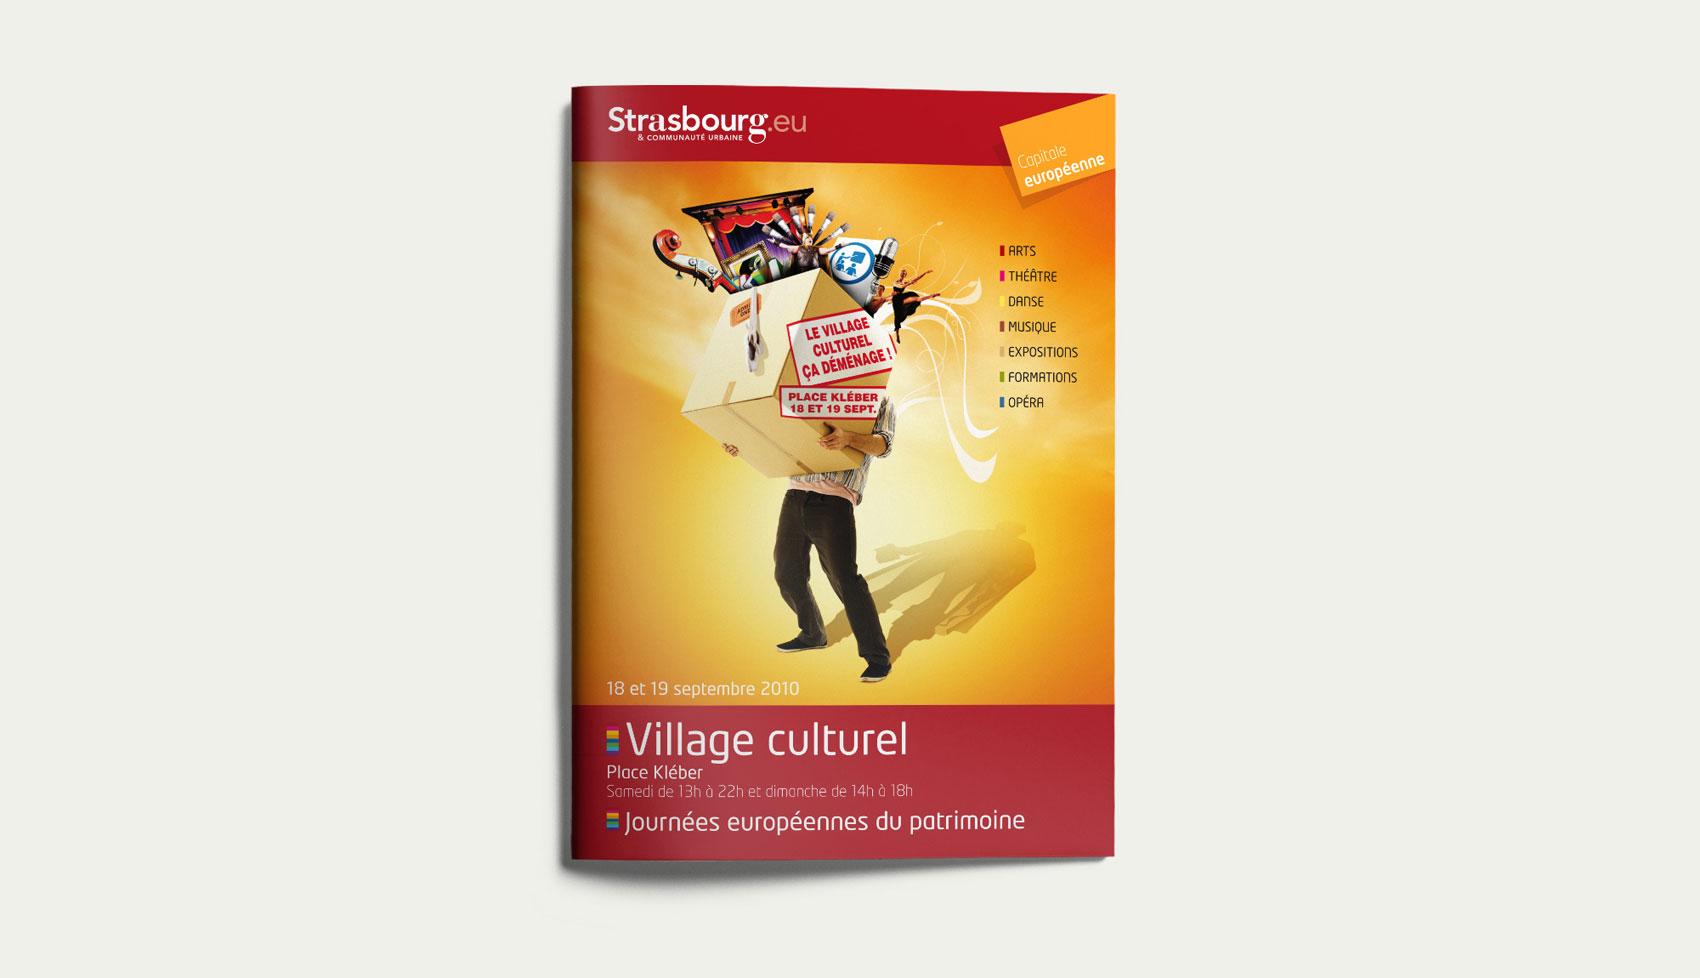 village-culturel-2010-2